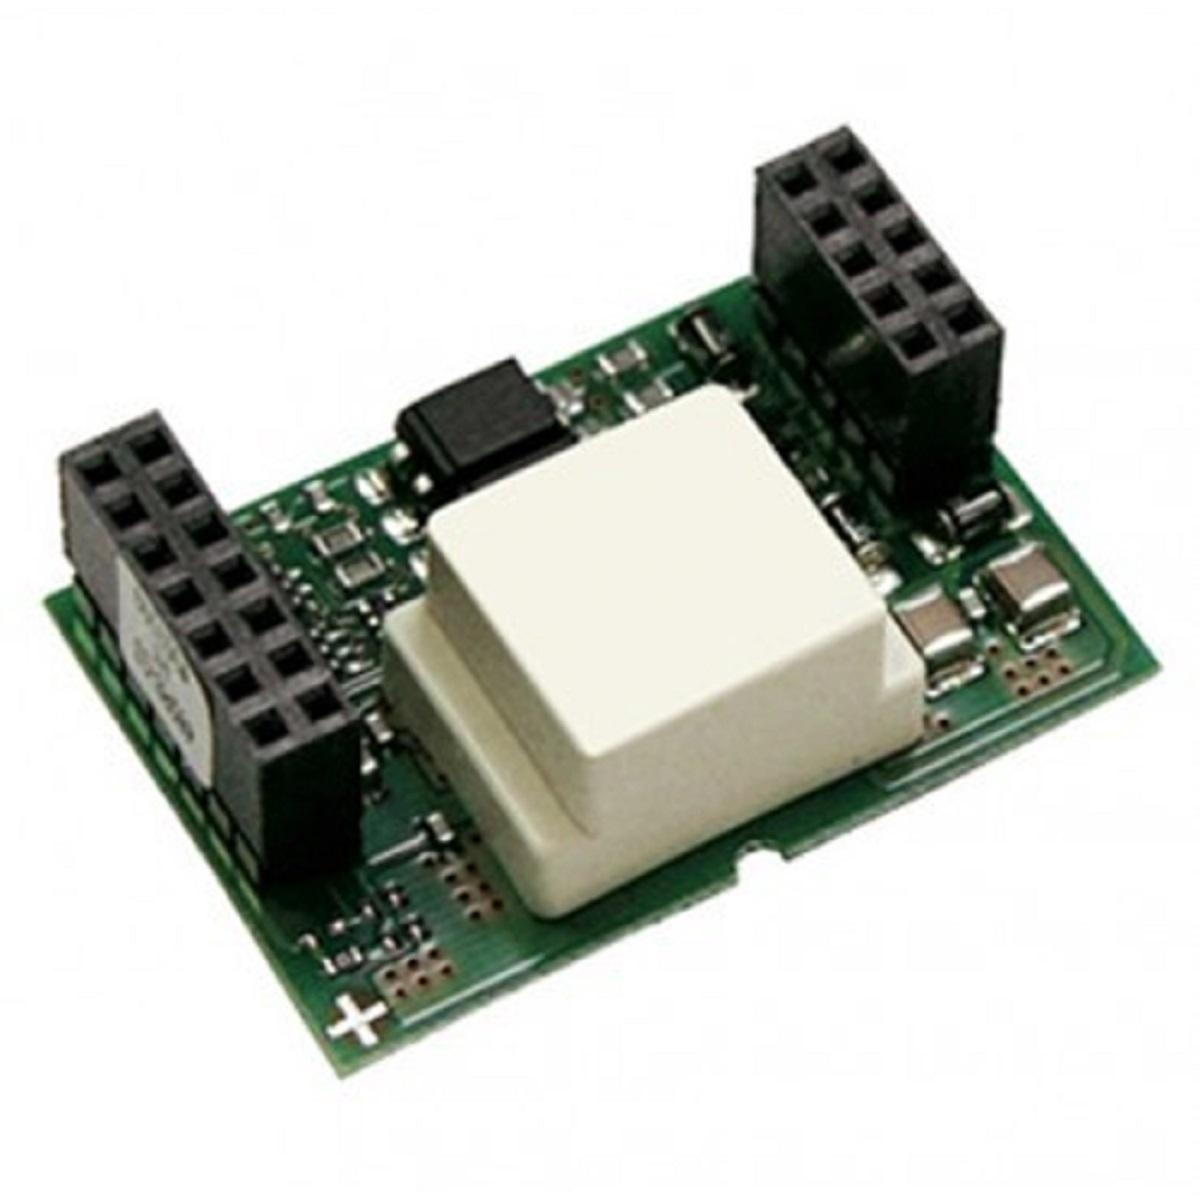 Sma Rs485 Piggyback Card 485uspb Nr Communication Upgrade